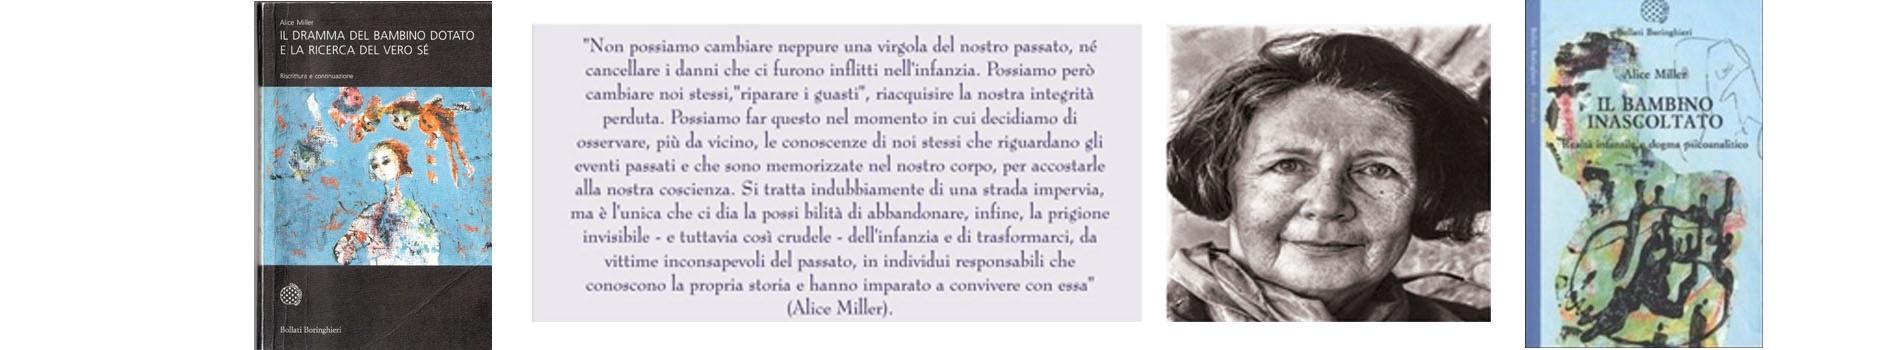 slide miller